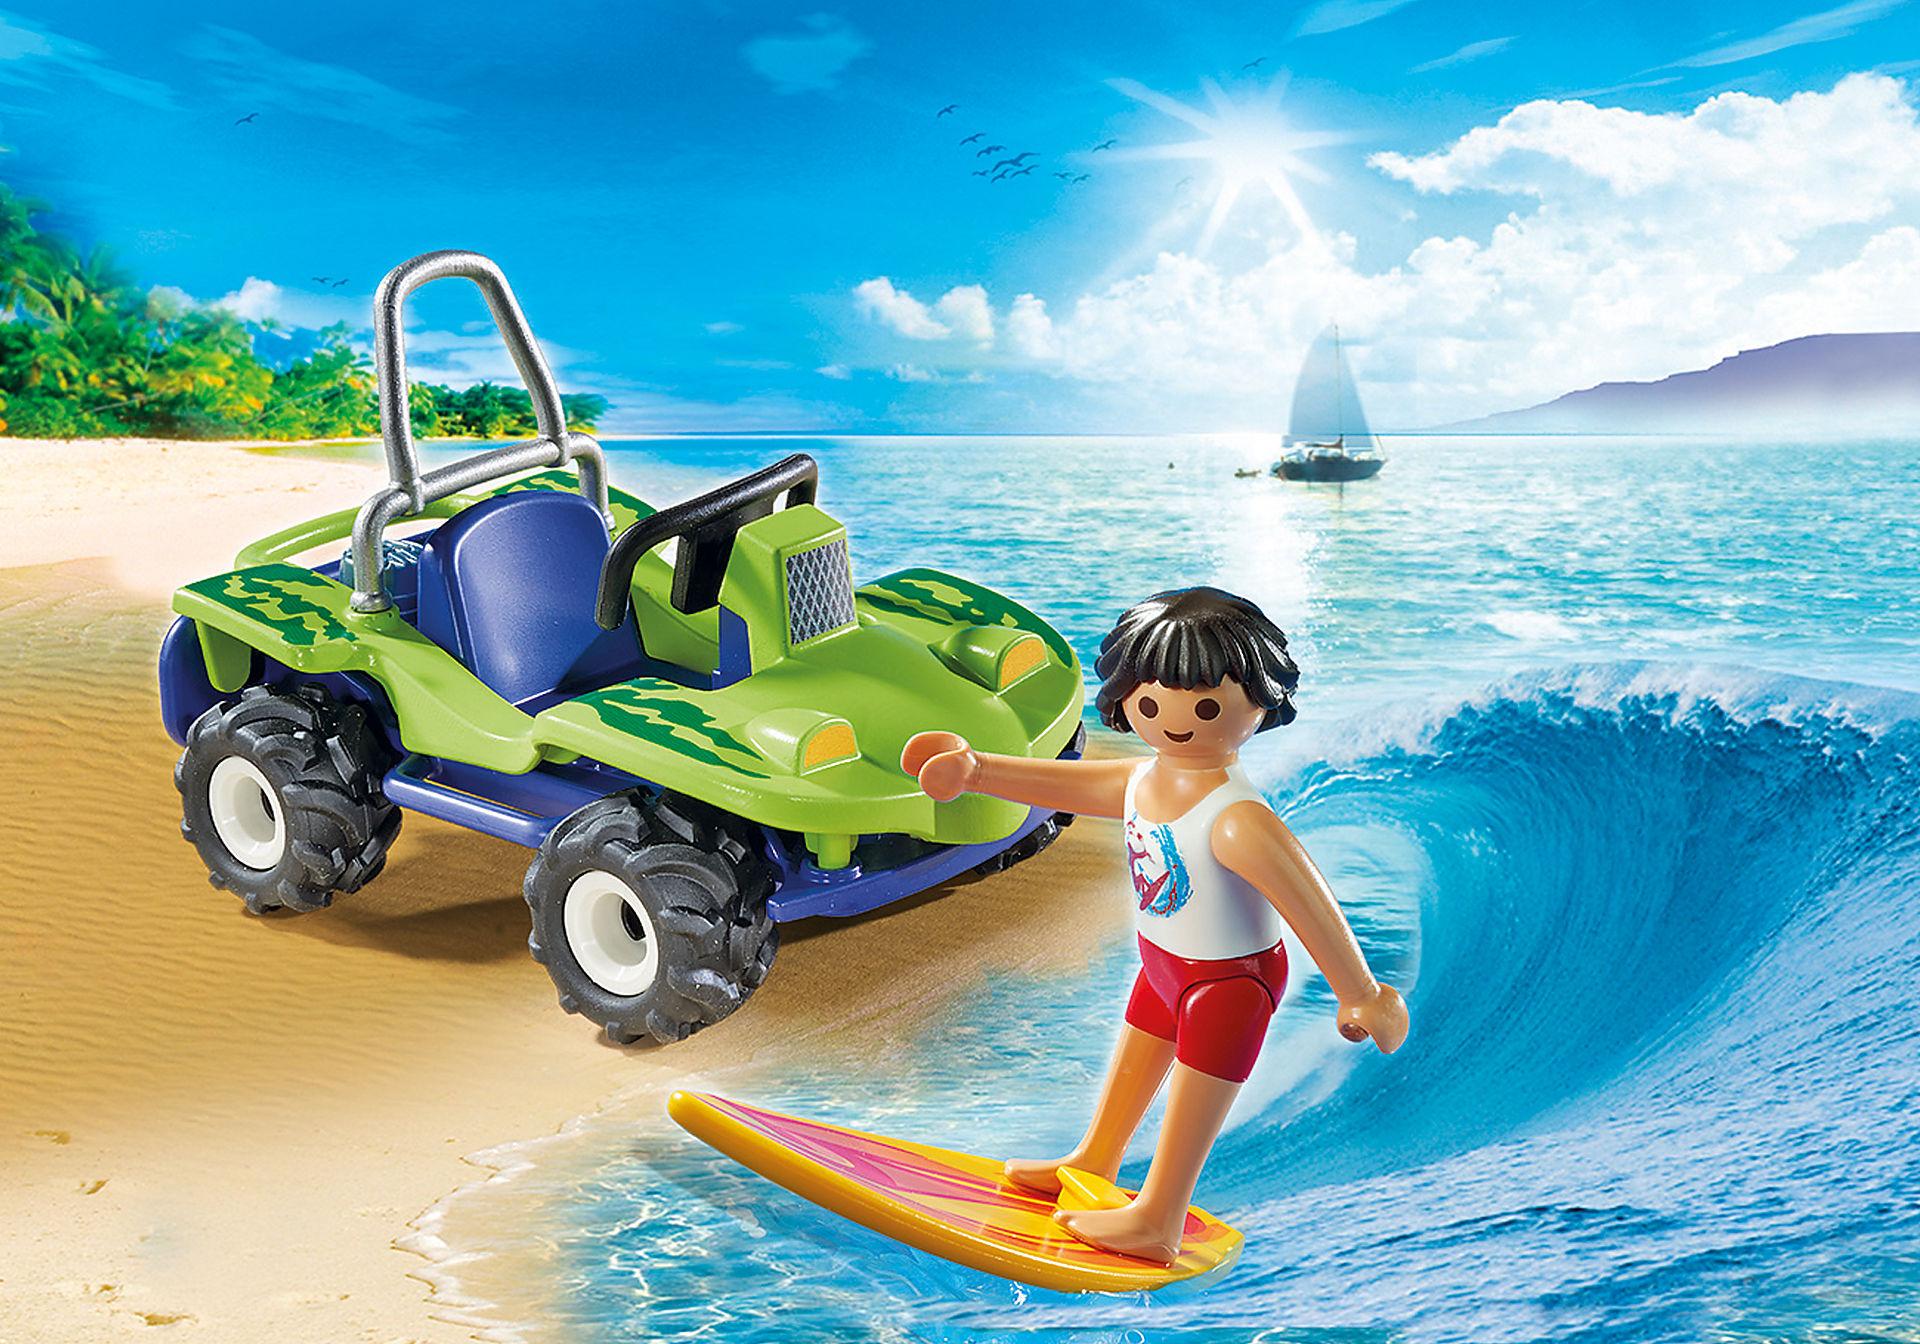 http://media.playmobil.com/i/playmobil/6982_product_detail/Surfer with Beach Quad